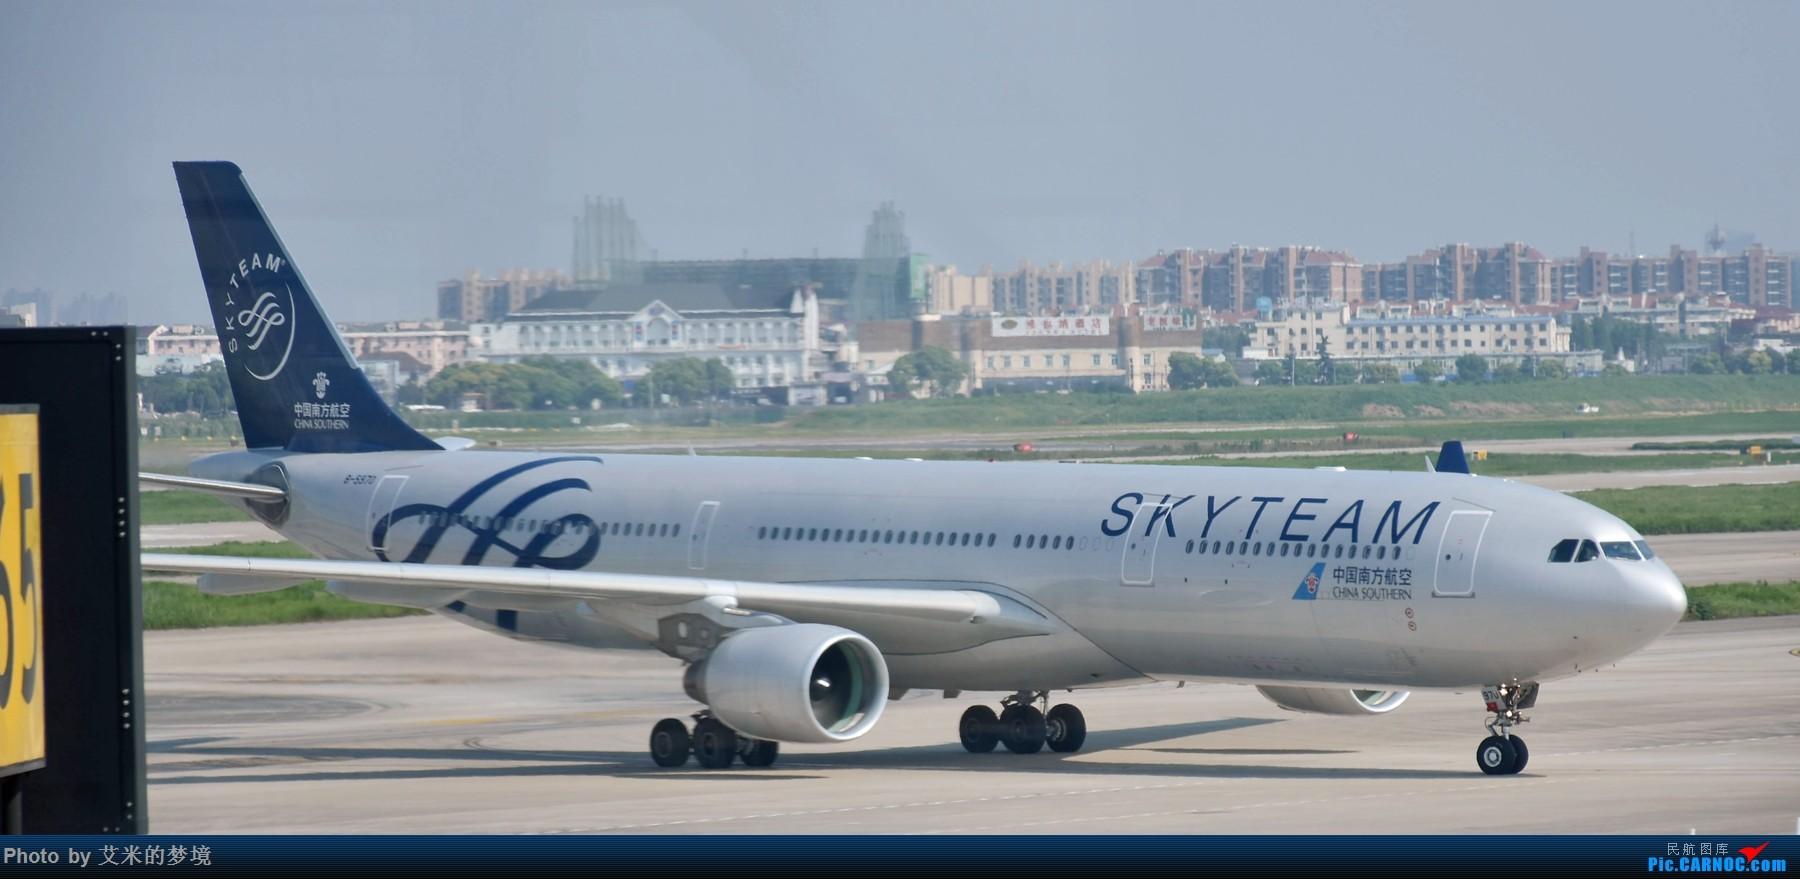 Re:[原创]【carnoc重庆飞友会】北京送行,所见飞行 AIRBUS A330-300 B-5970 中国上海虹桥国际机场